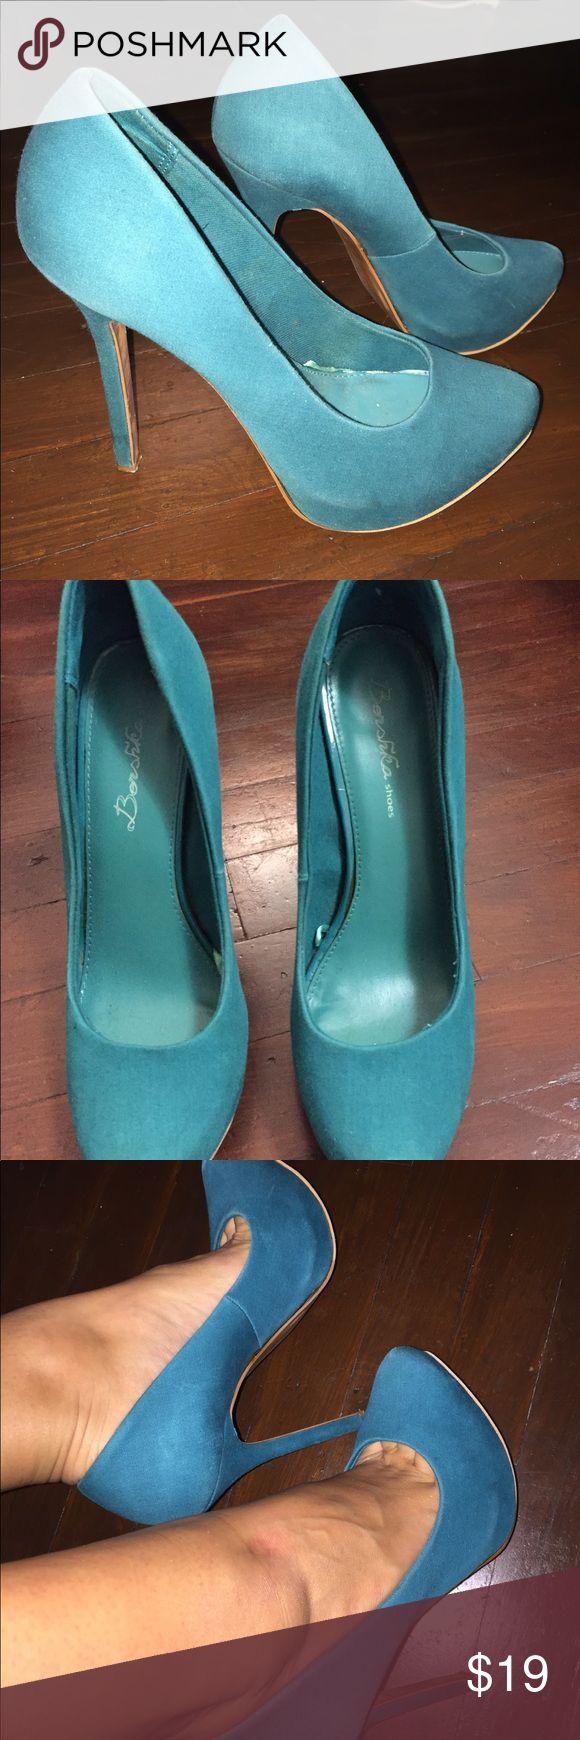 Bershka teal high heel shoes Bershka teal high heel shoes size EU 39, US 9 Bershka Shoes Heels